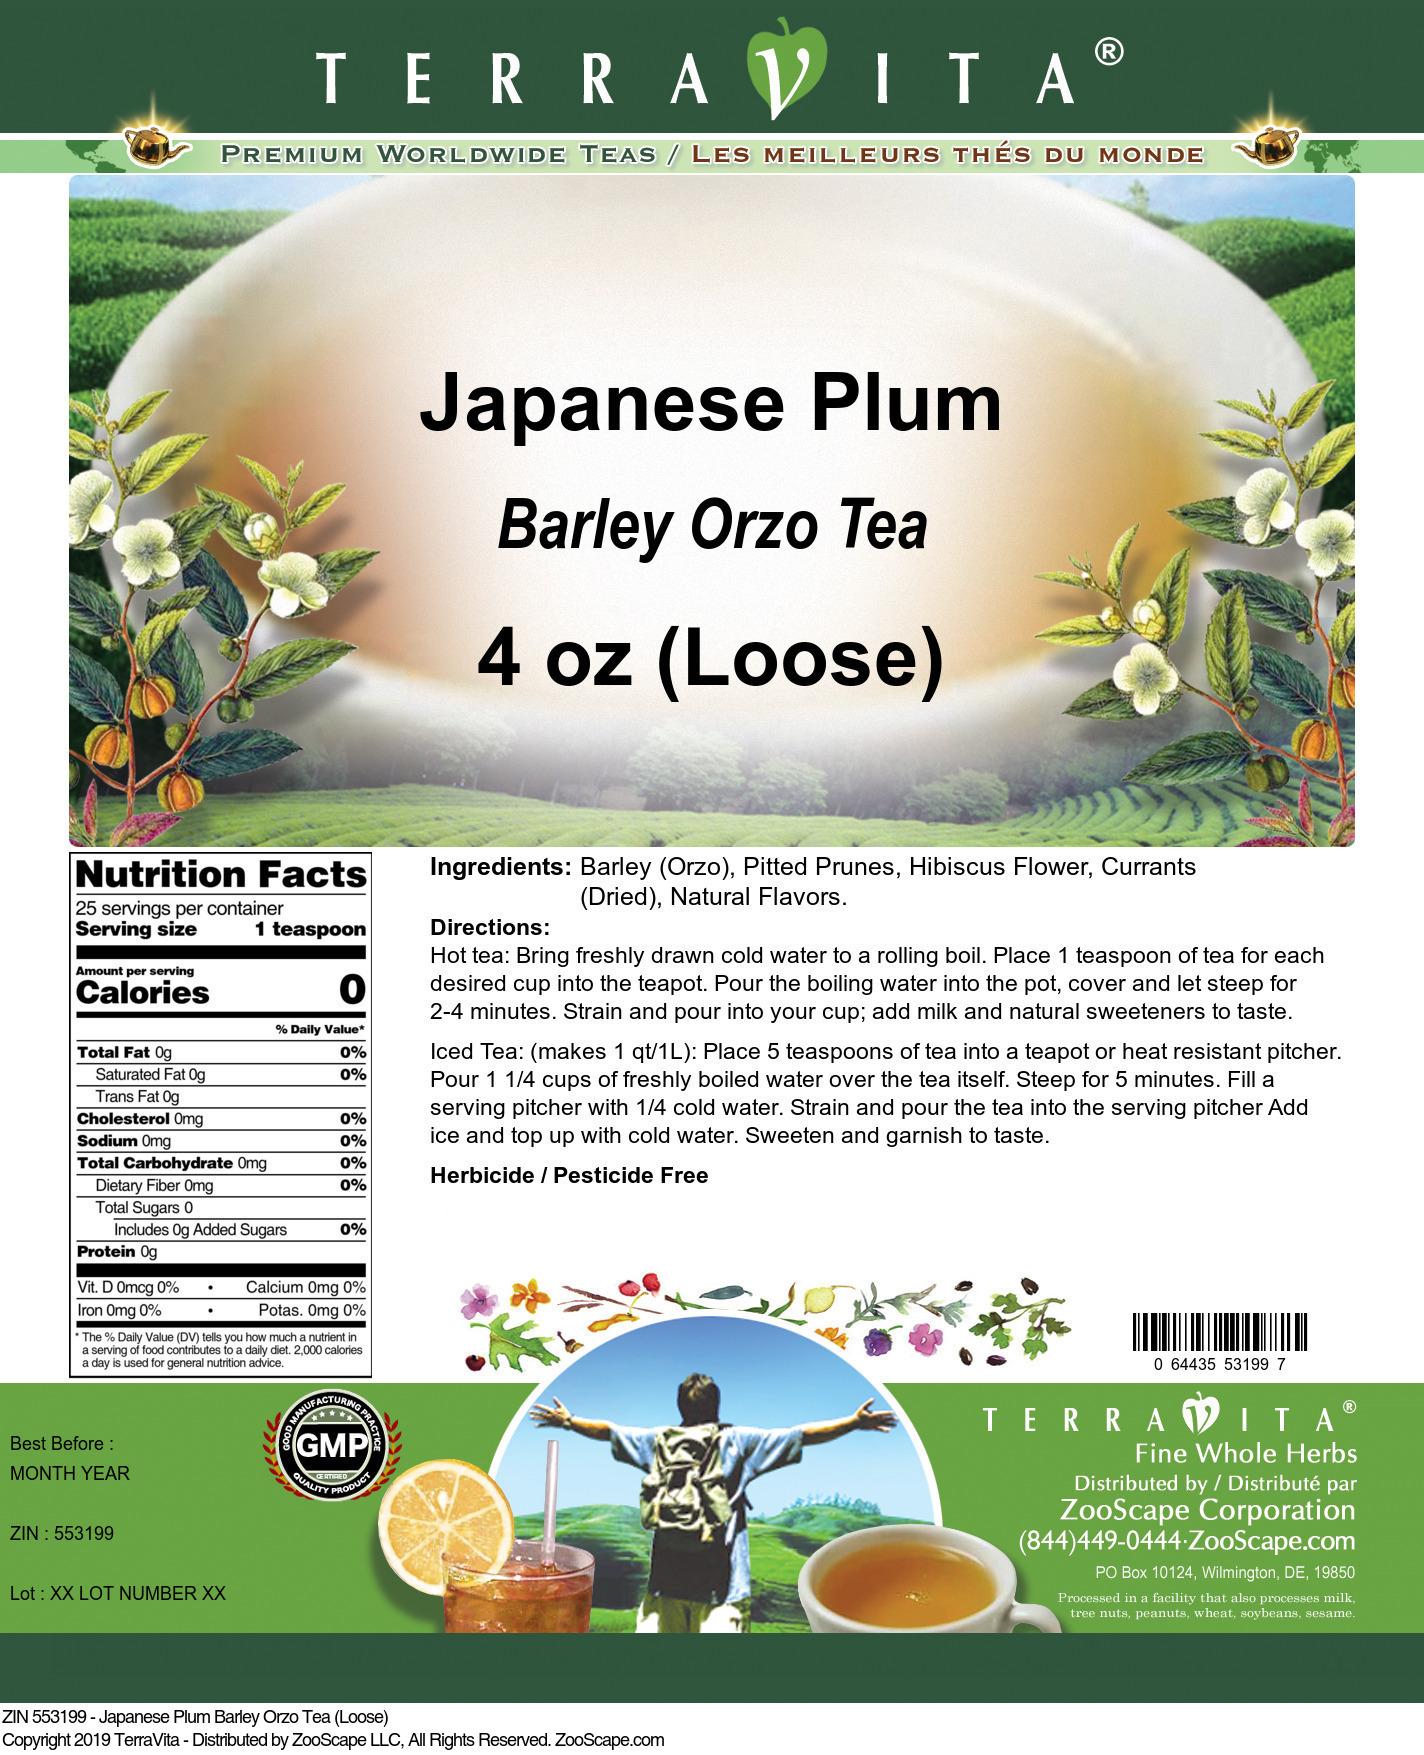 Japanese Plum Barley Orzo